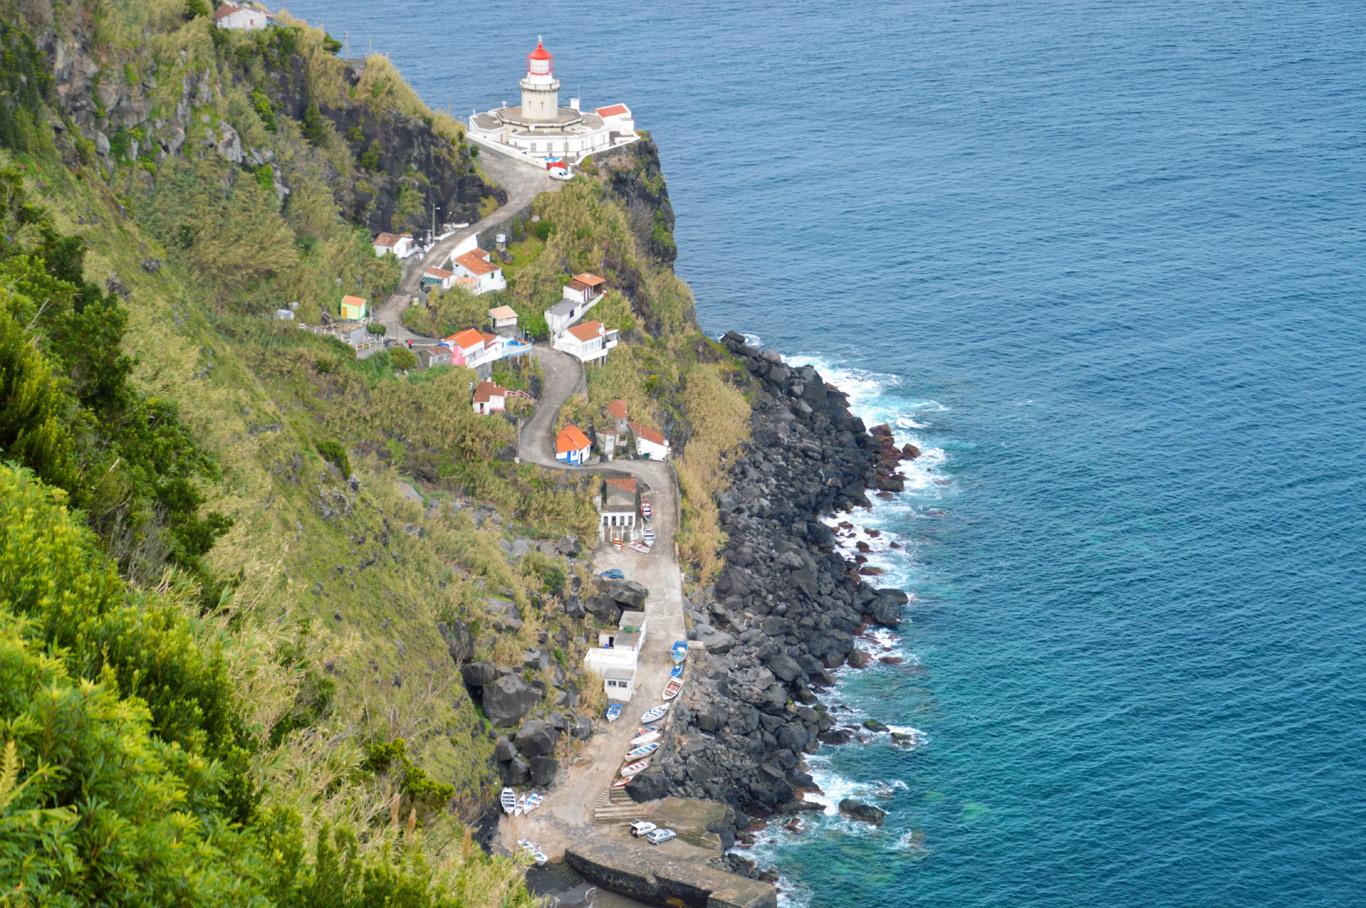 Lighthouse Arnel